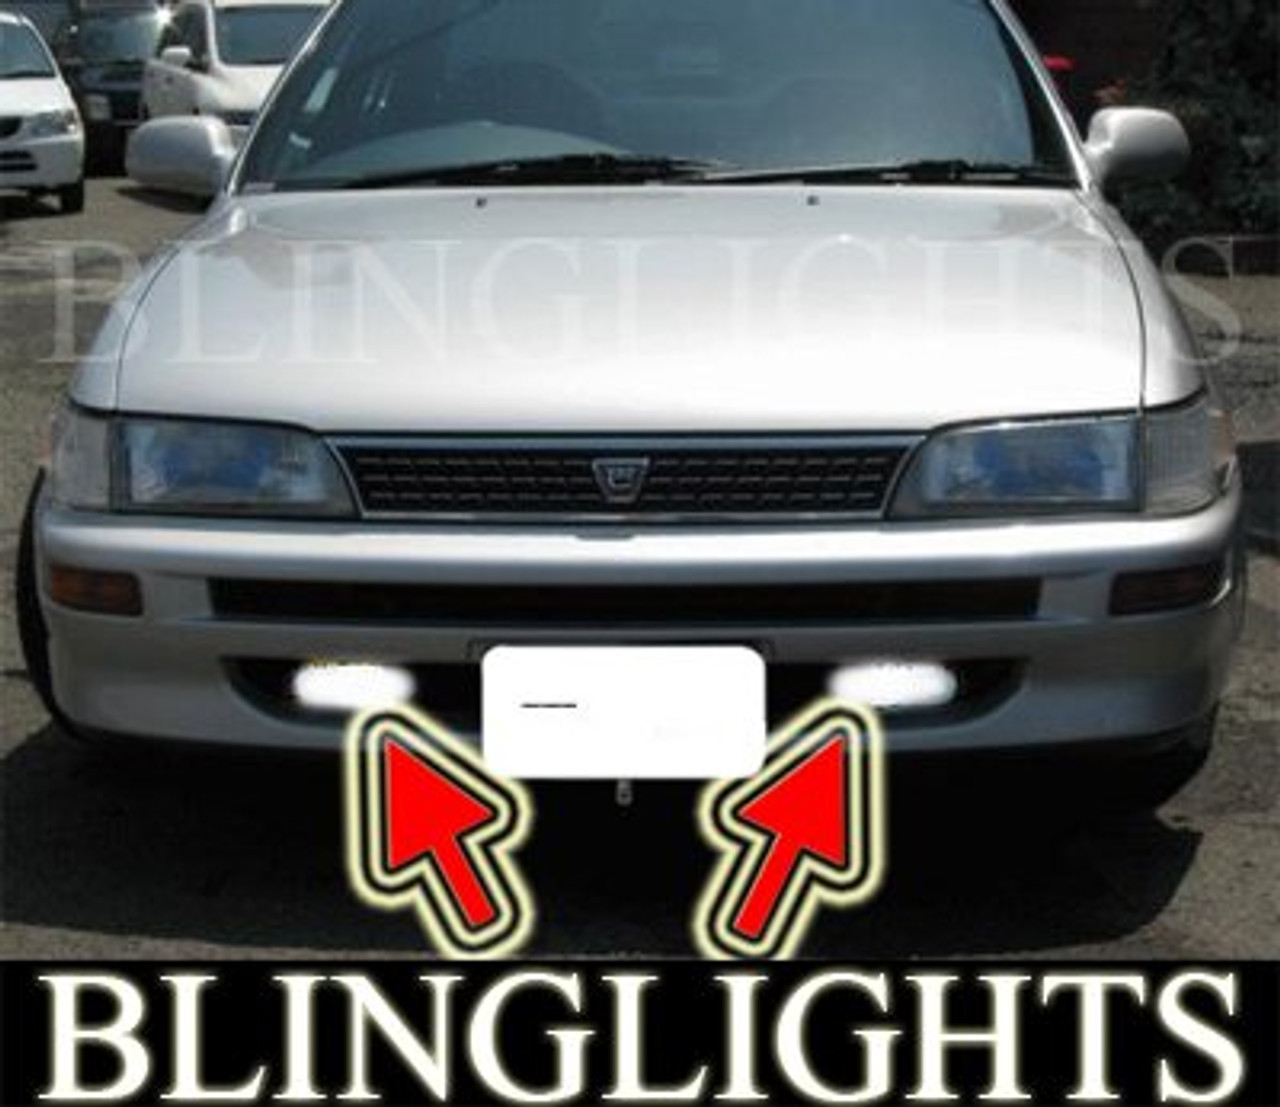 1992 1993 1994 1995 1996 1997 Toyota Corolla Saloon Xenon Fog Lamps Driving Lights Foglamp Foglight